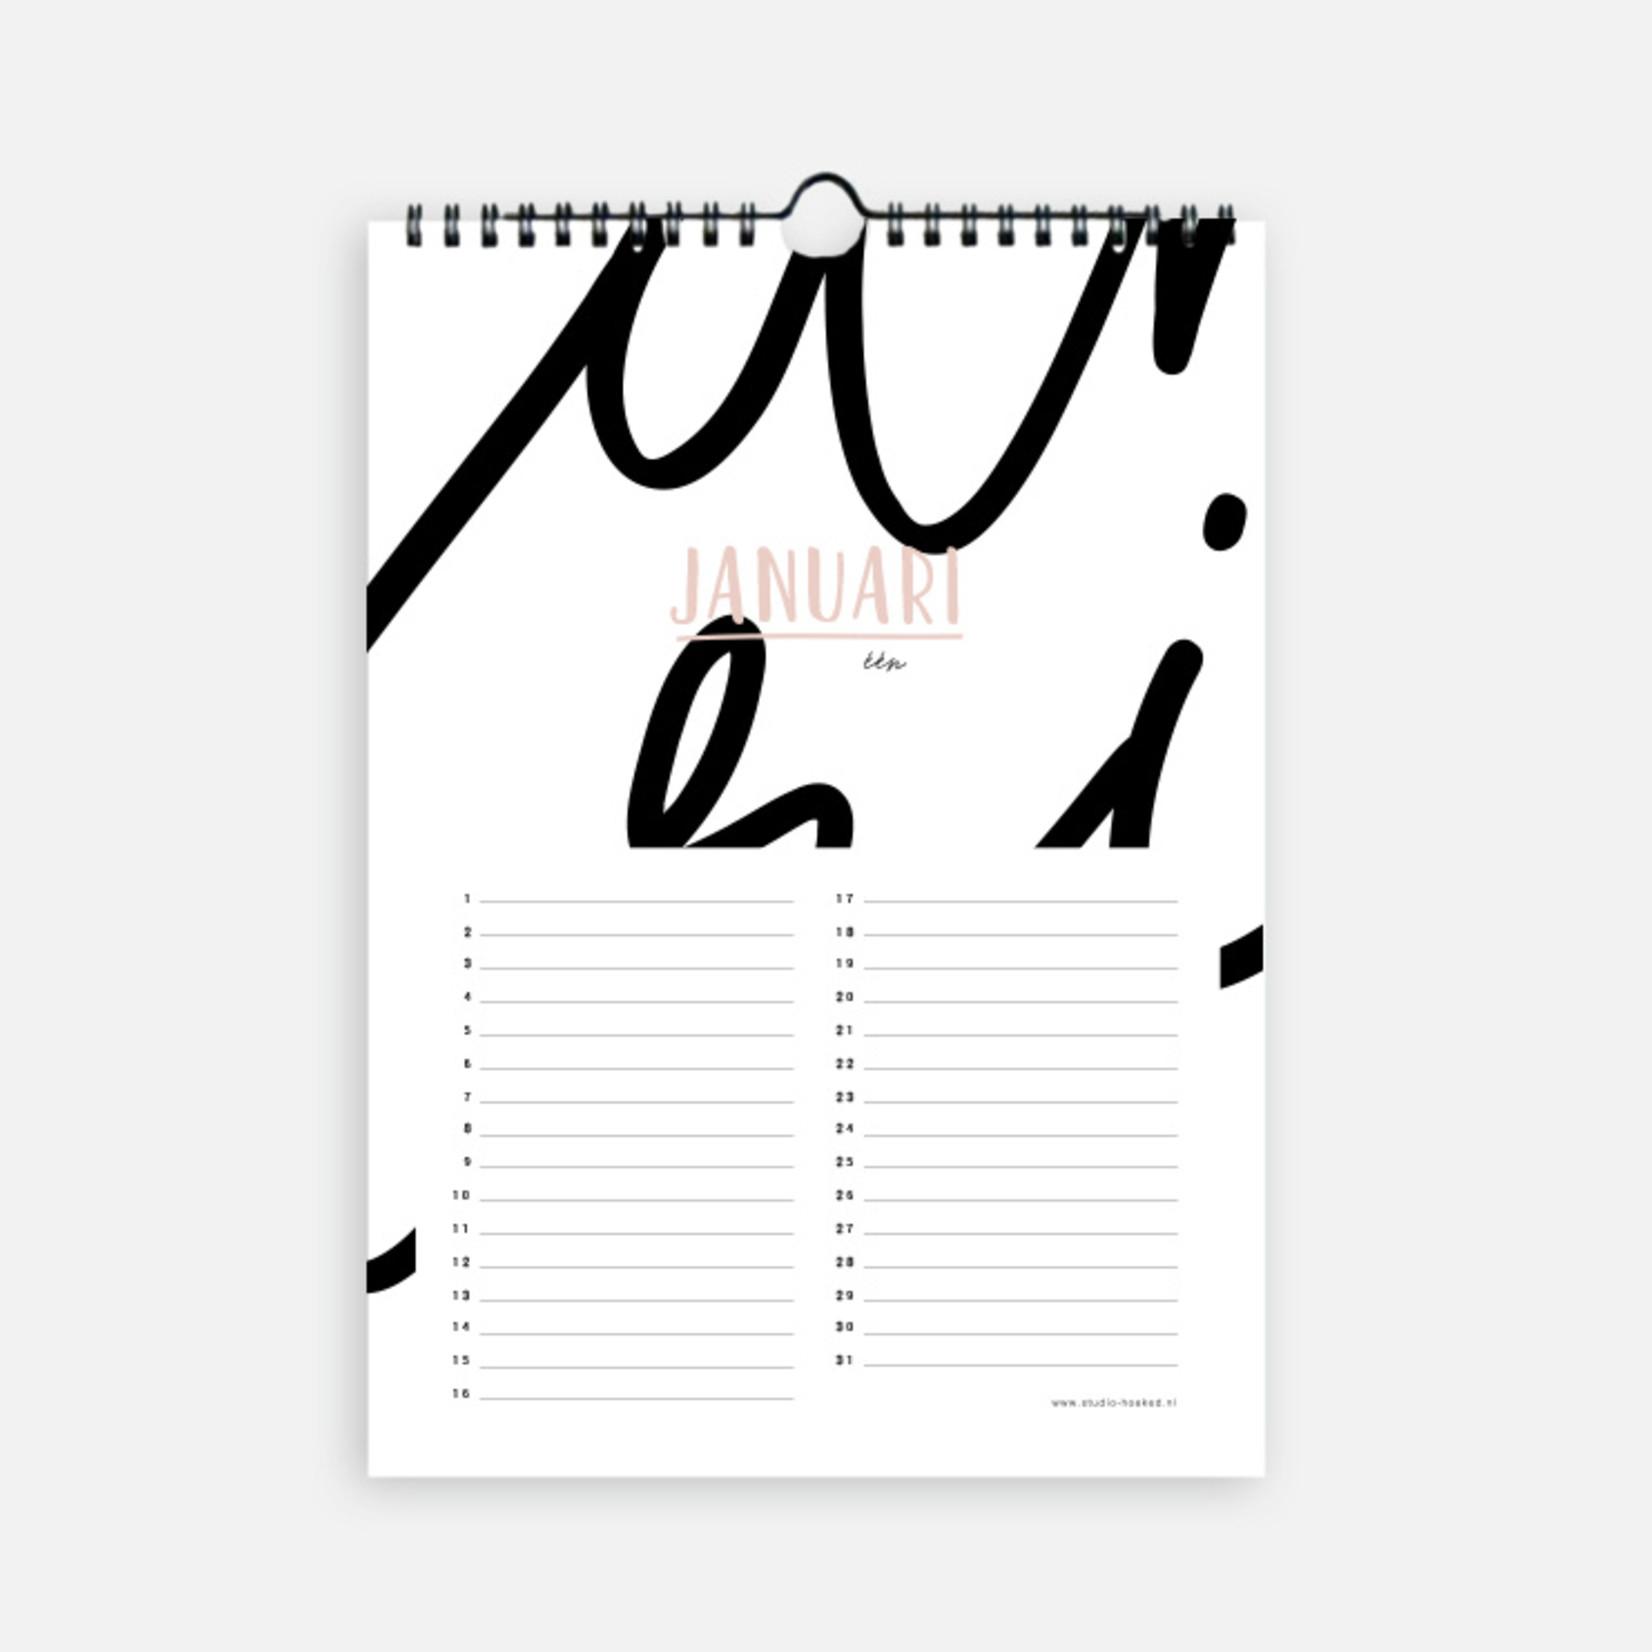 Studio Hoeked Kalender  Celebrate